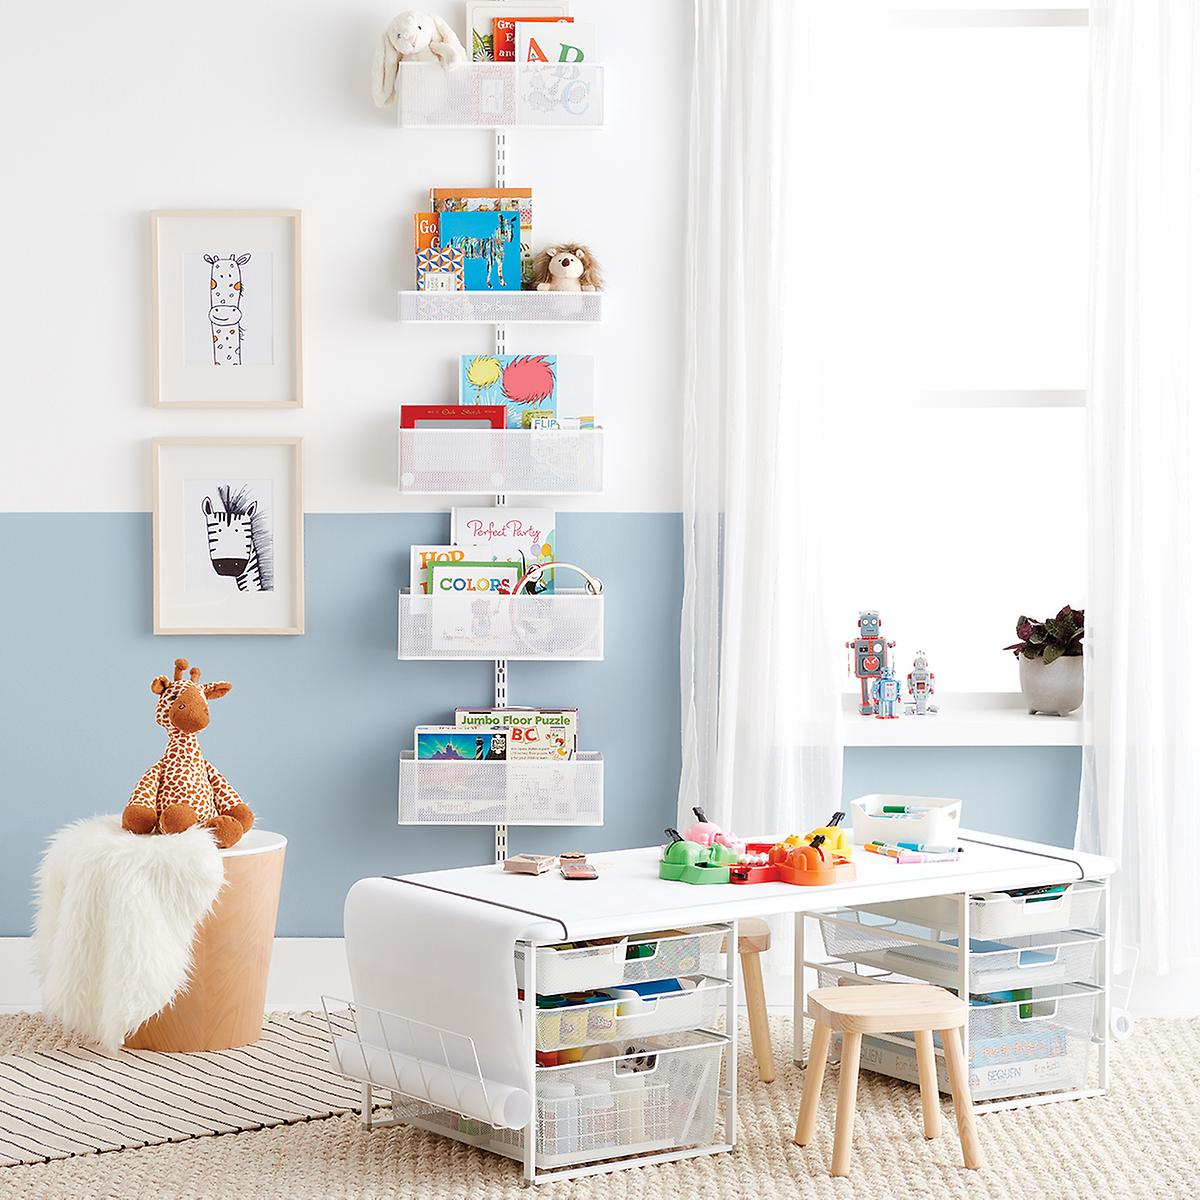 Bedroom organizing ideas wall rack